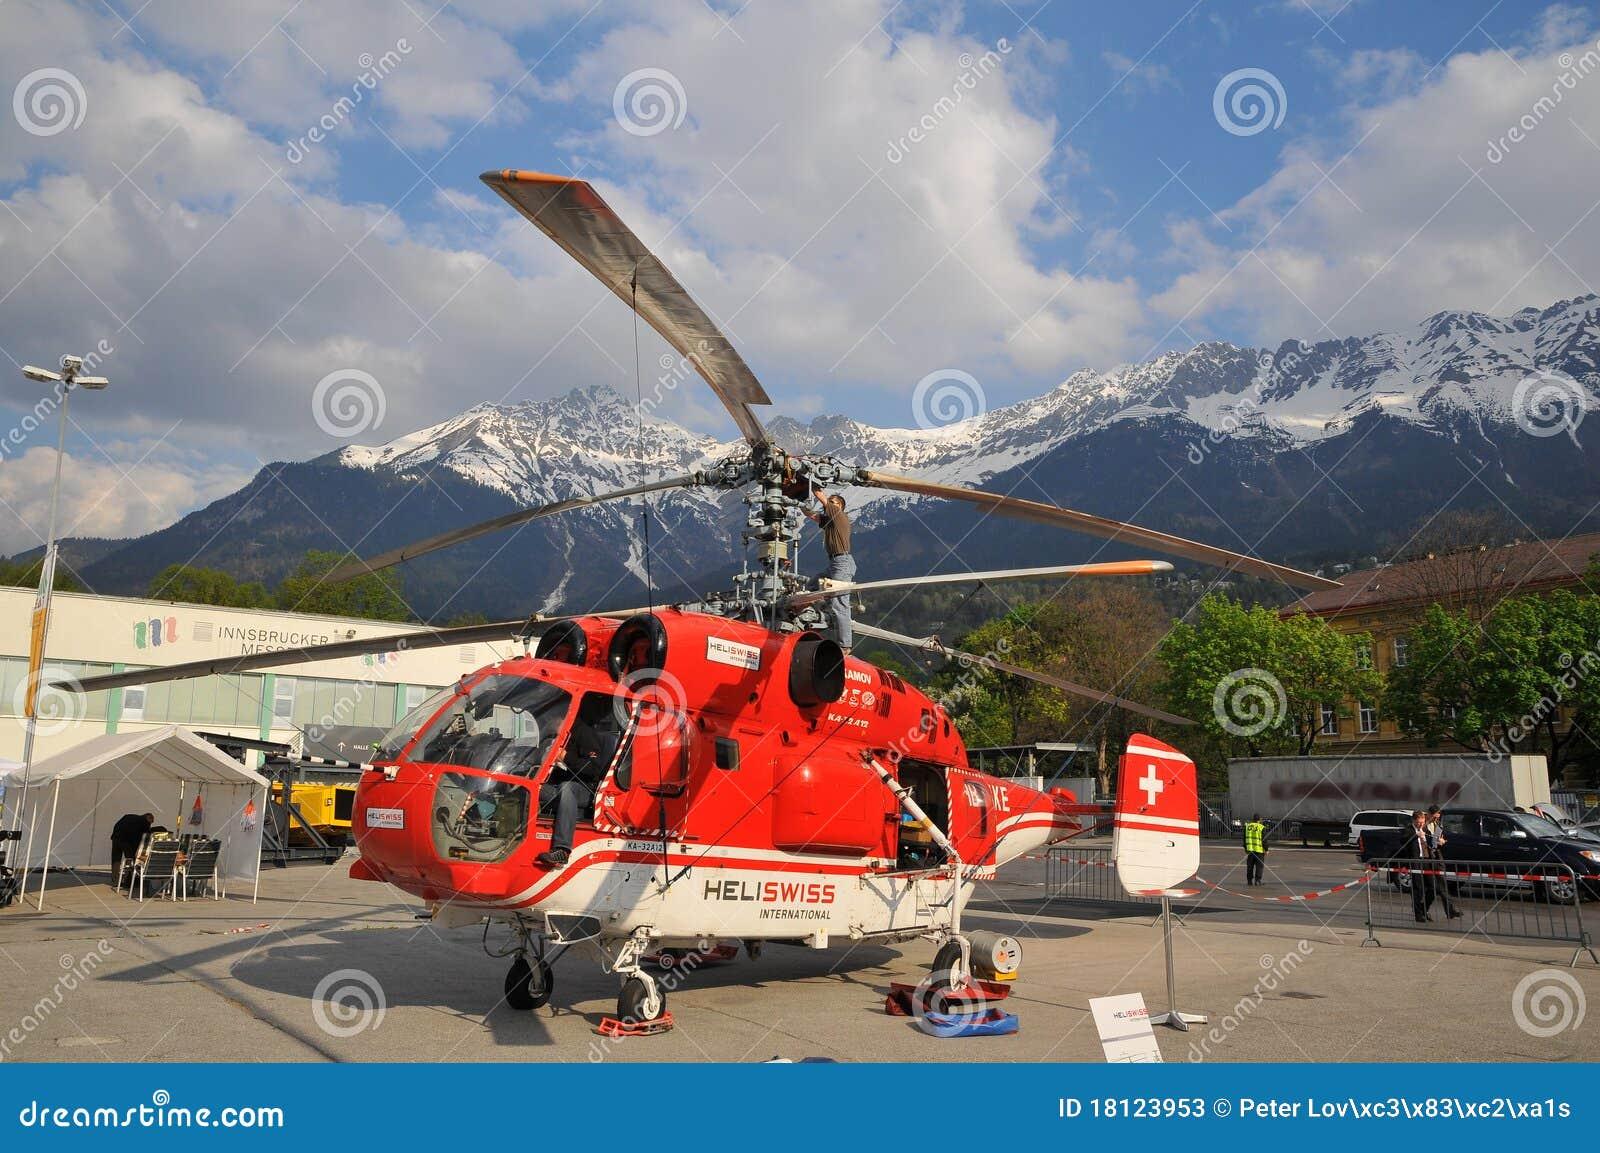 Elicottero Kamov : Elicottero ka di kamov a hb xke fotografia stock